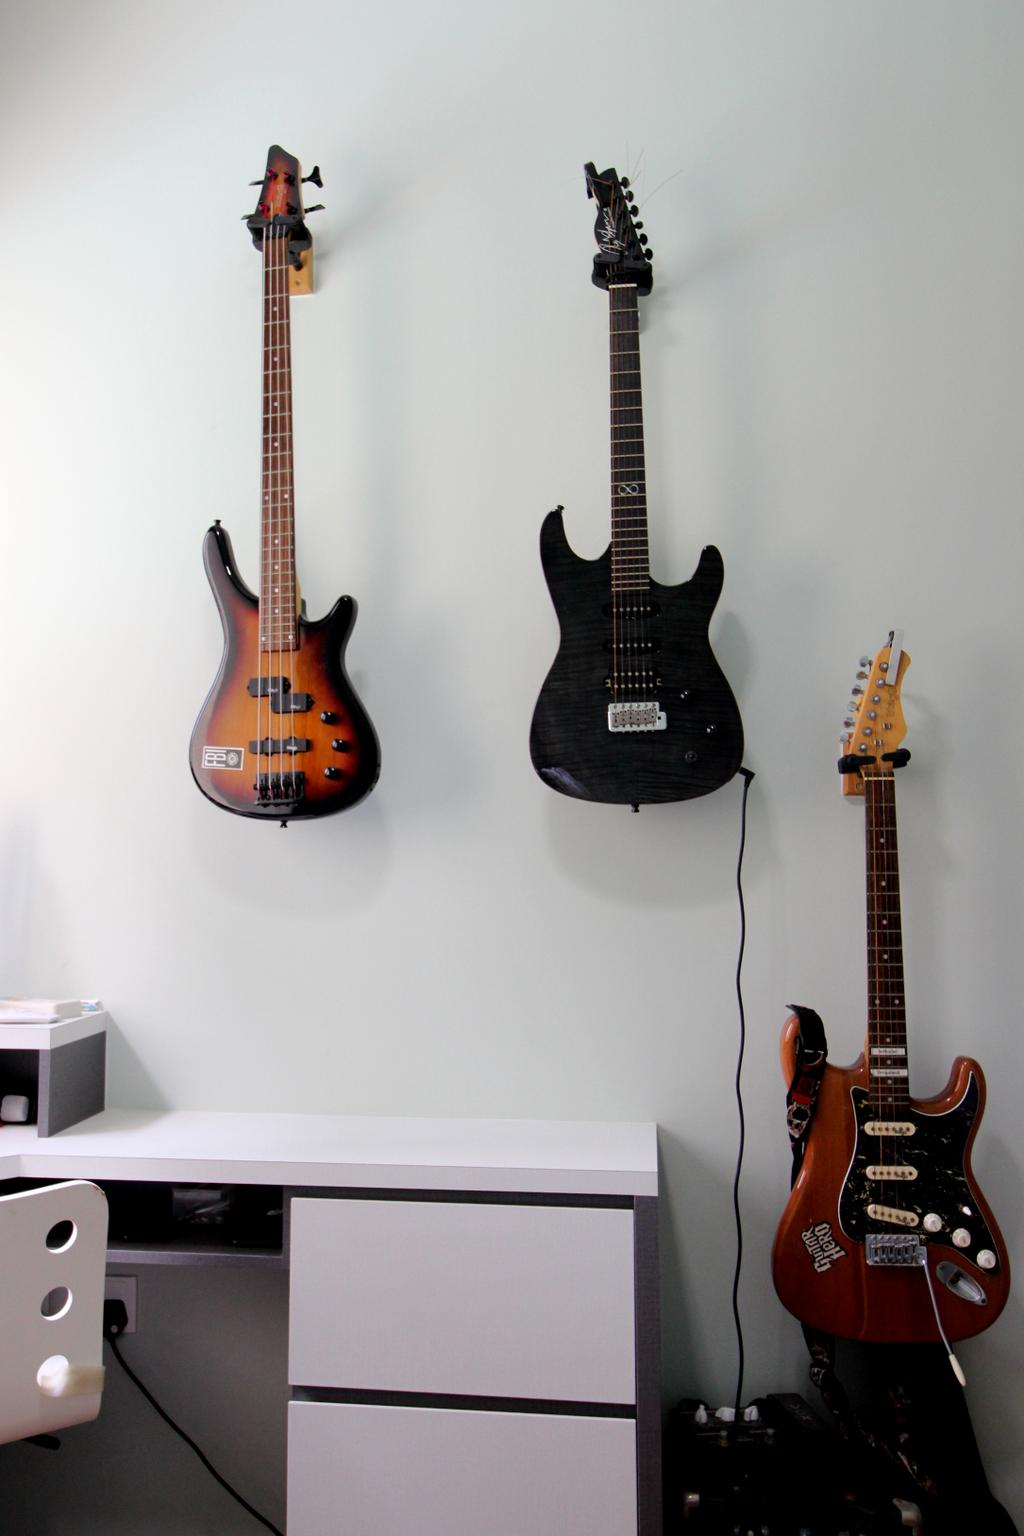 Condo, The Amore, Interior Designer, Aestherior, Electric Guitar, Guitar, Leisure Activities, Music, Musical Instrument